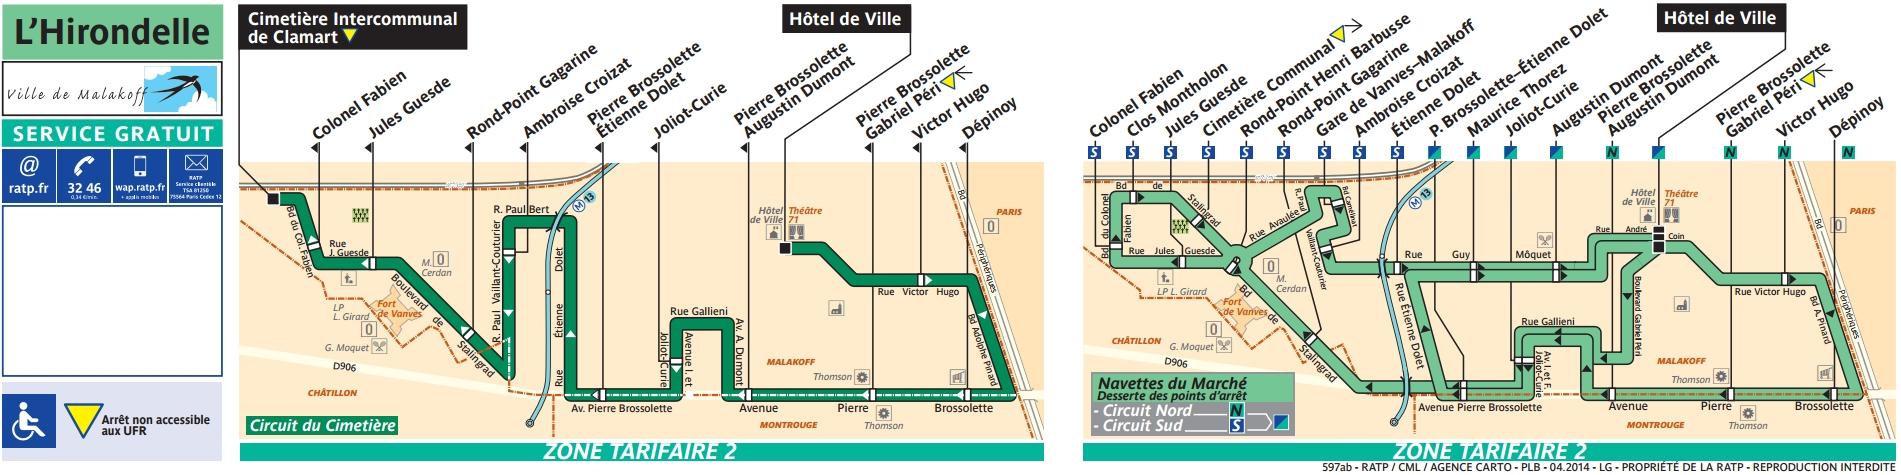 Plan bus Ligne 597